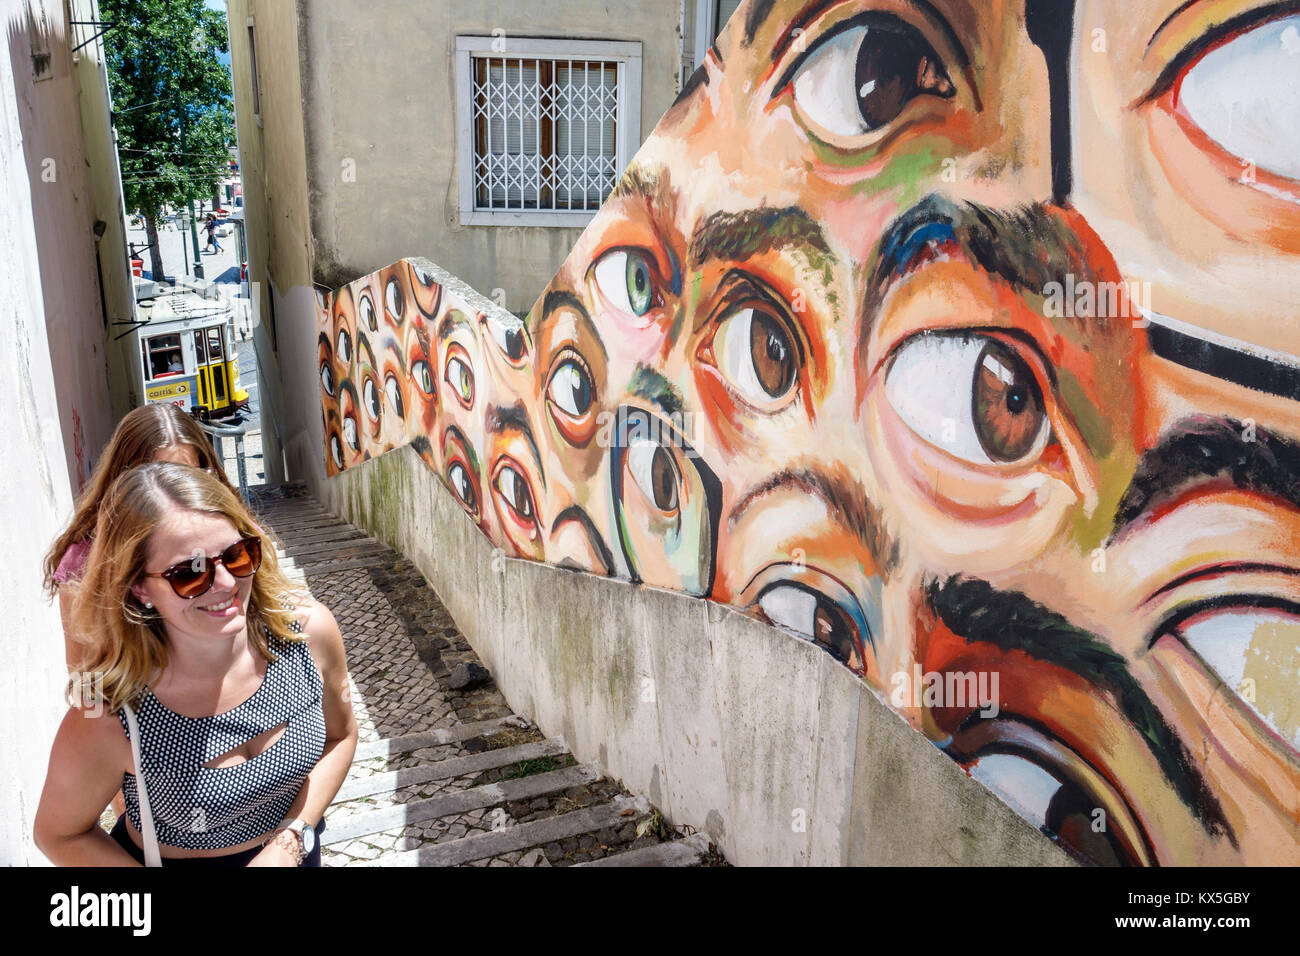 Lisbon Portugal Alfama historic neighborhood Beco do Maldonado stairs alley graffiti street art woman eyeballs eyes - Stock Image